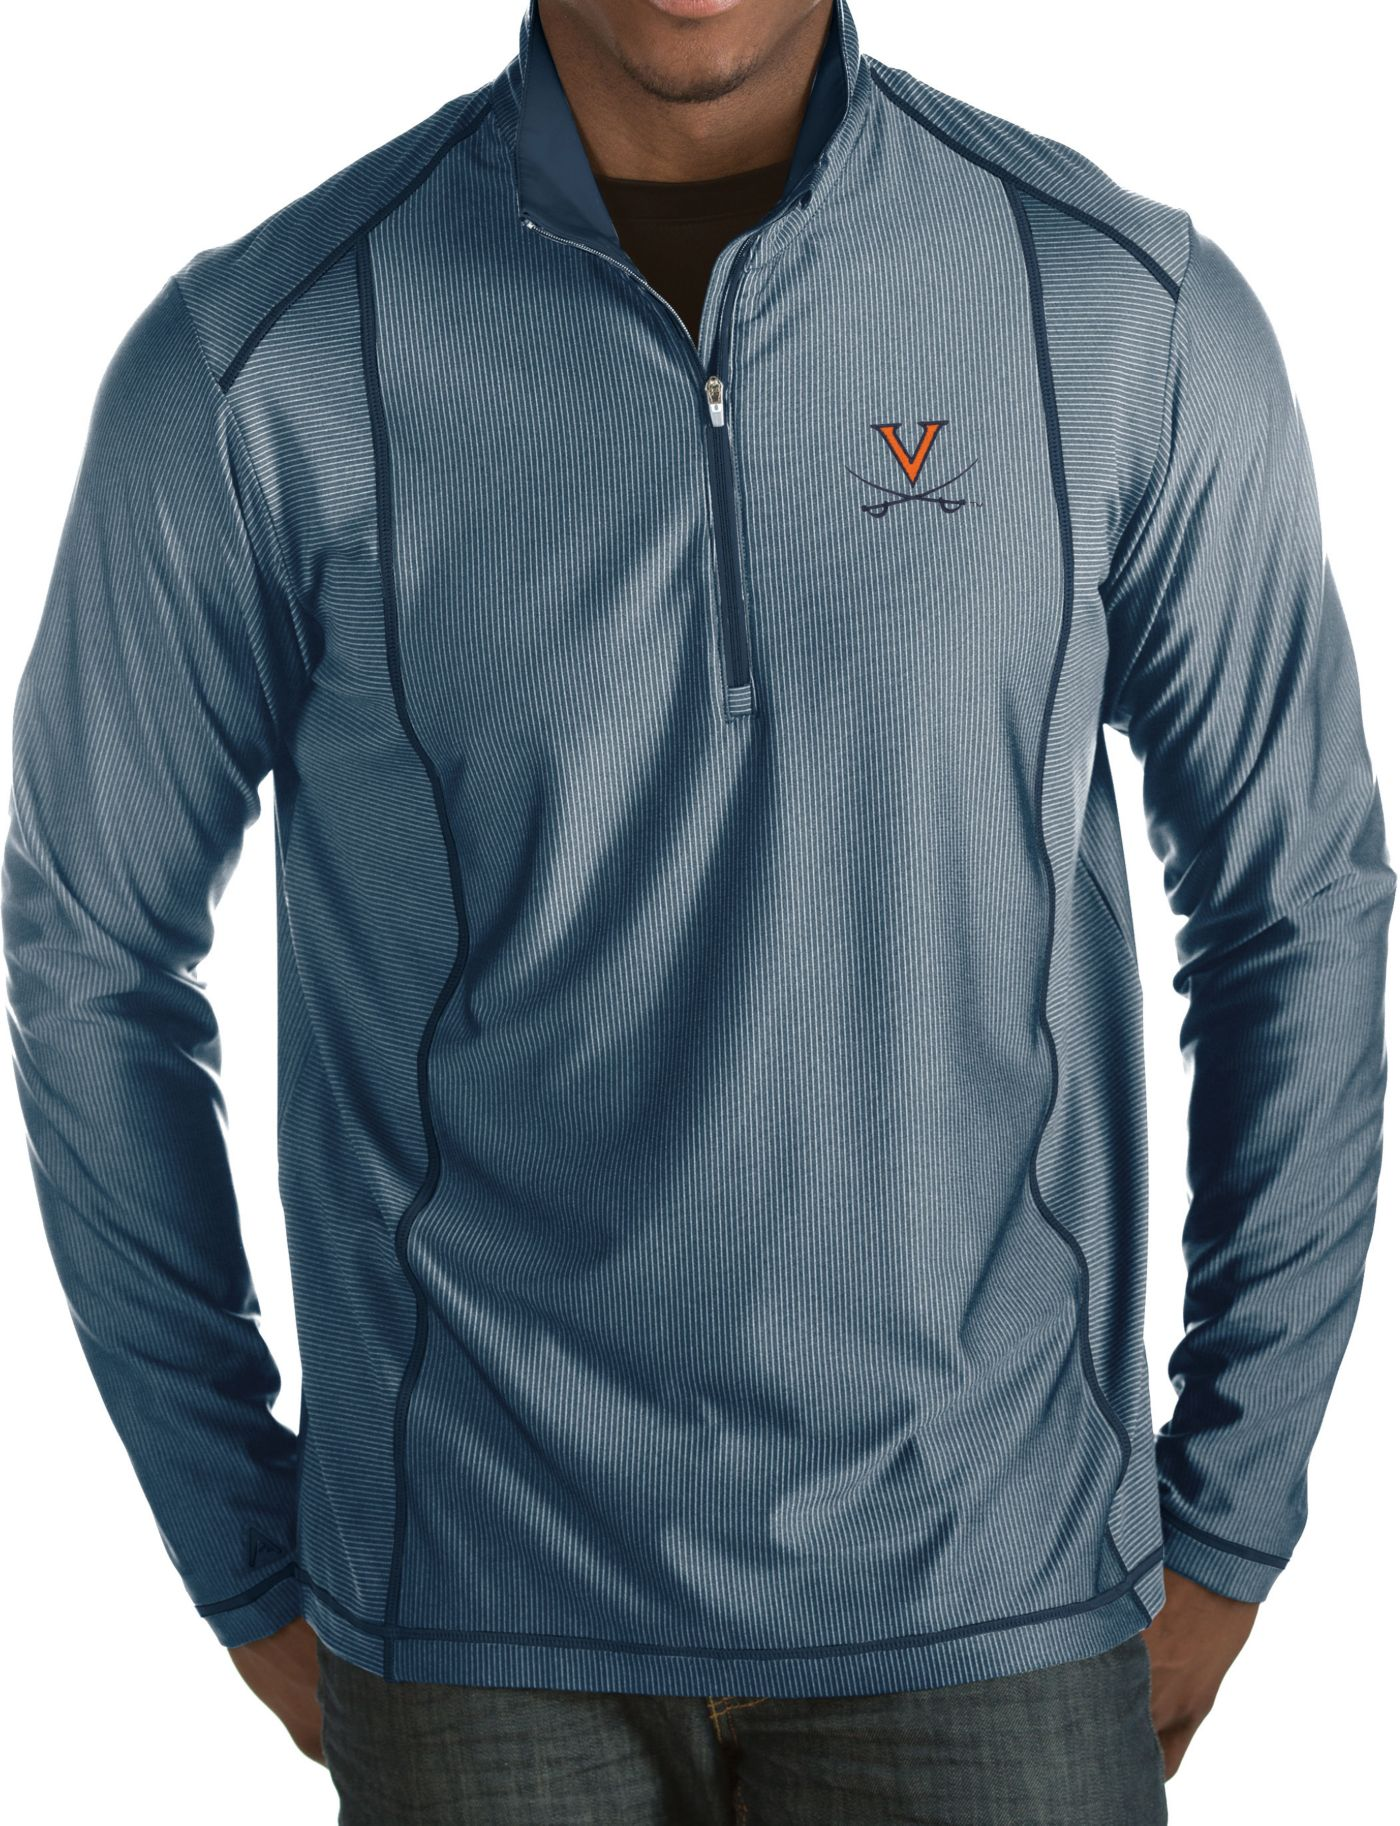 Antigua Men's Virginia Cavaliers Blue Tempo Half-Zip Pullover